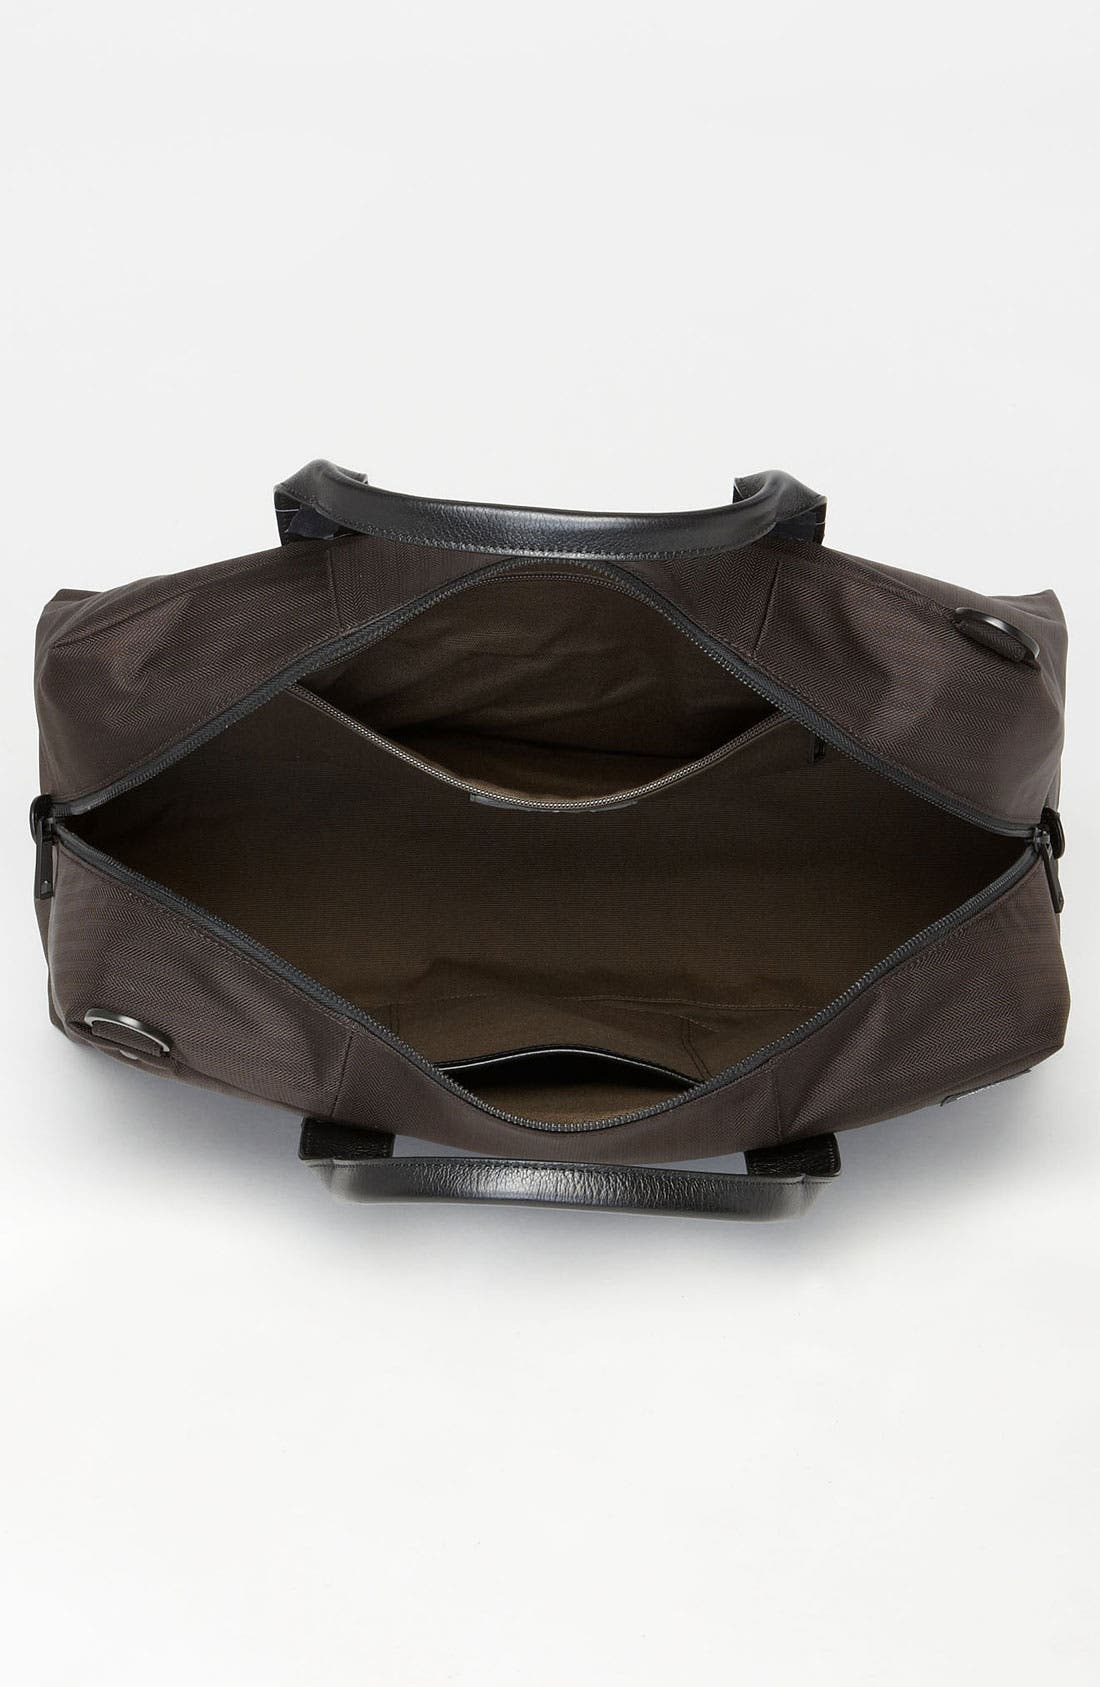 Alternate Image 3  - Jack Spade 'Wayne' Nylon Duffel Bag